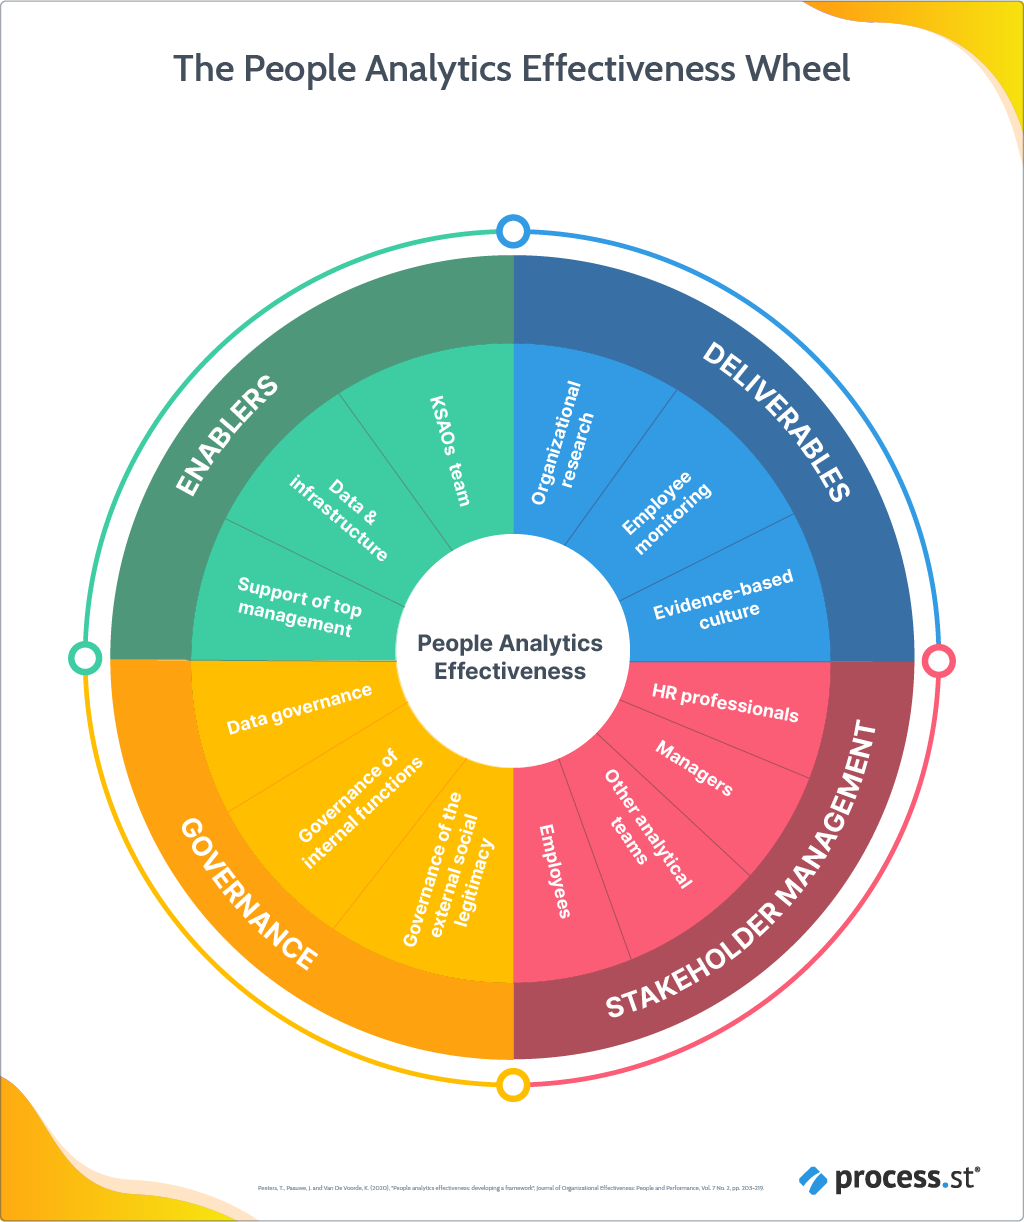 The People Analytics Effectiveness Wheel